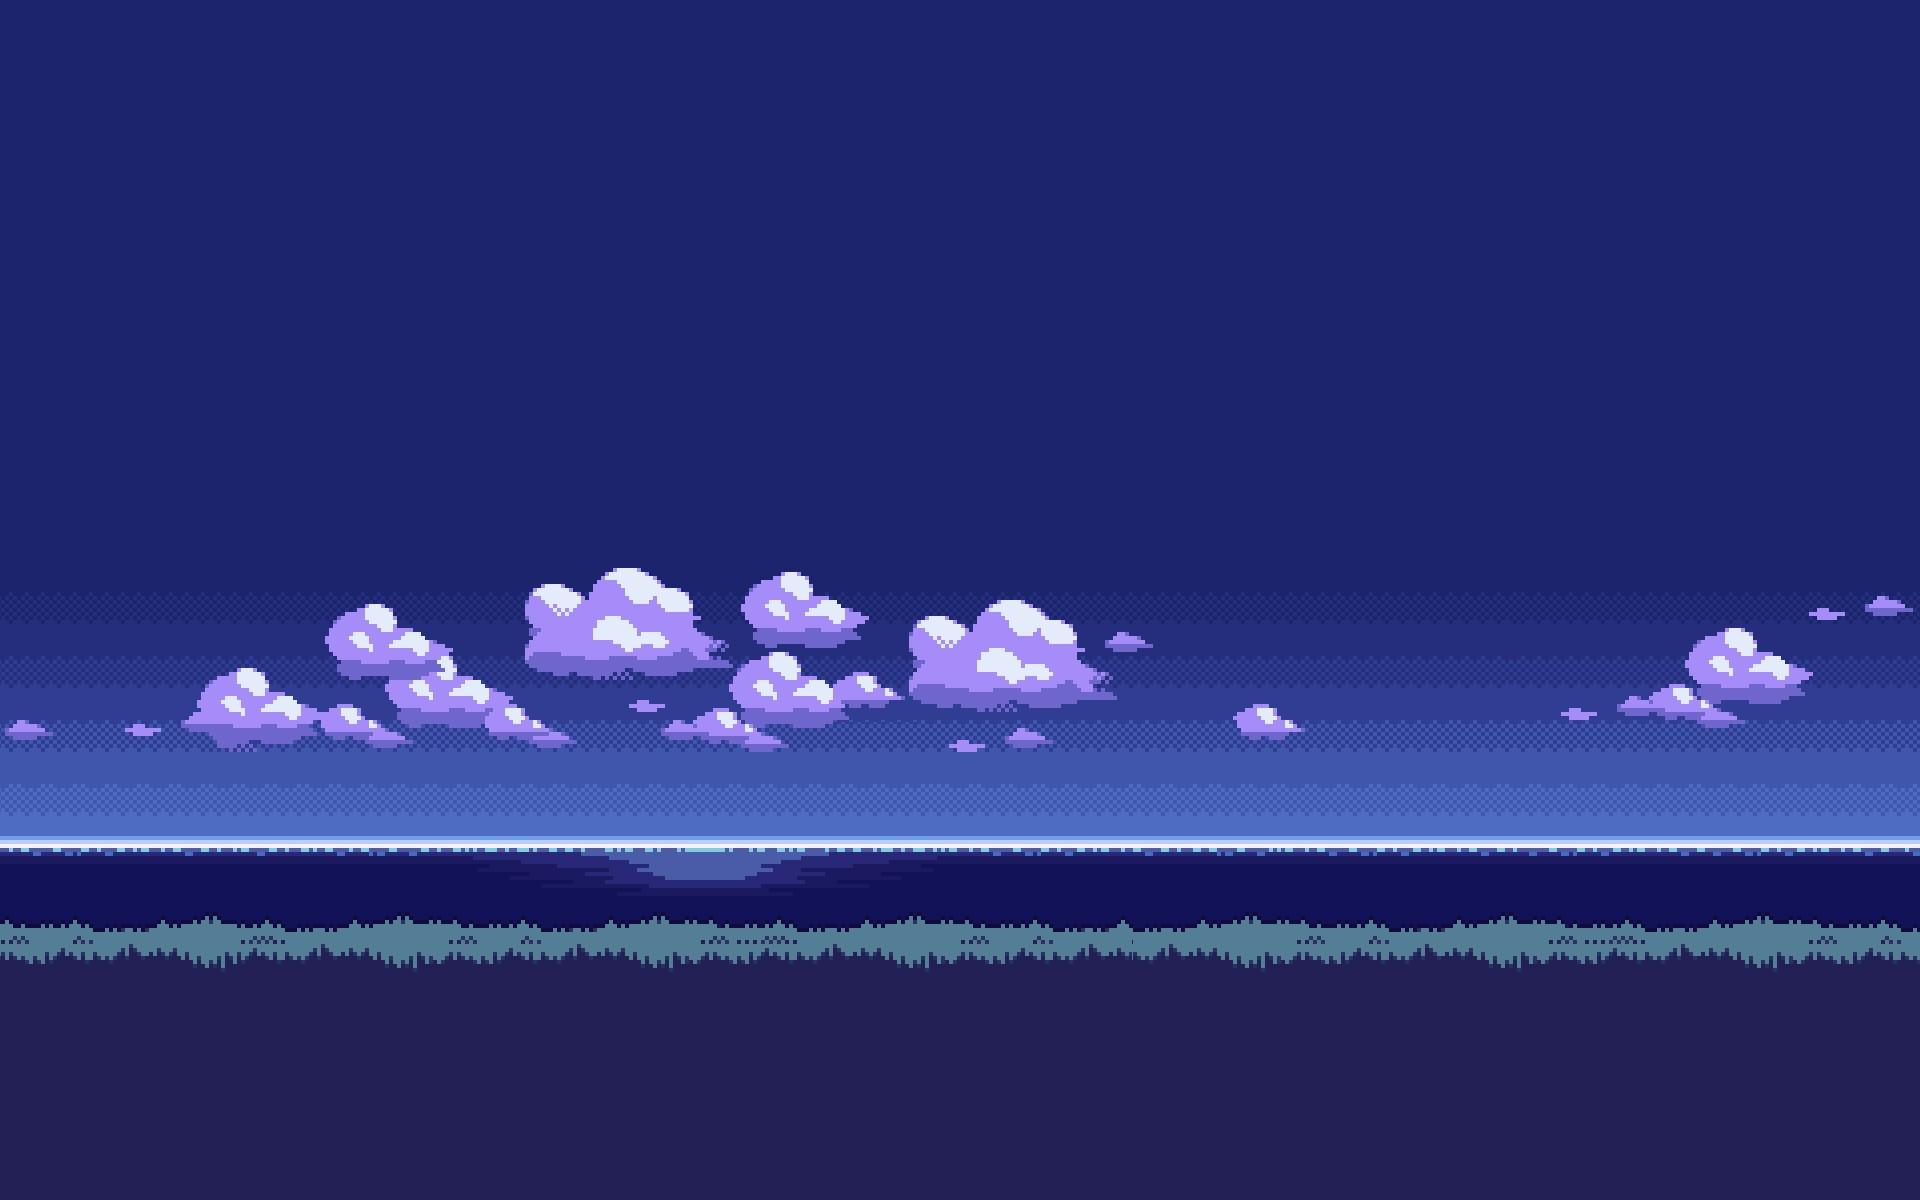 Wallpaper : pixel art, sky, moonlight, 8 bit, cloud